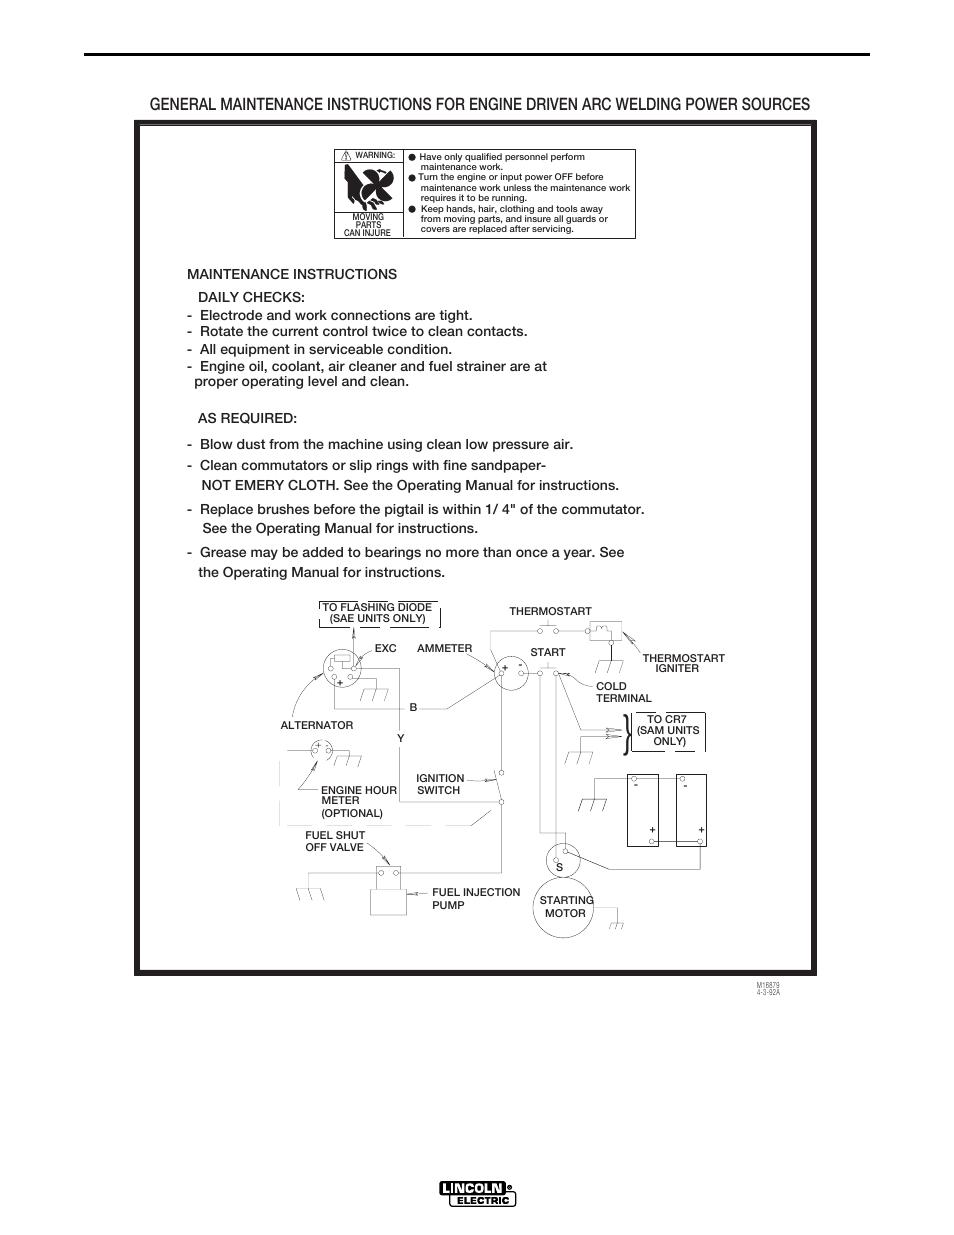 Lincoln Sam 400 Wiring Diagram Trusted Diagrams Oven Sam400 Engine Dia Gram Electric Beaver